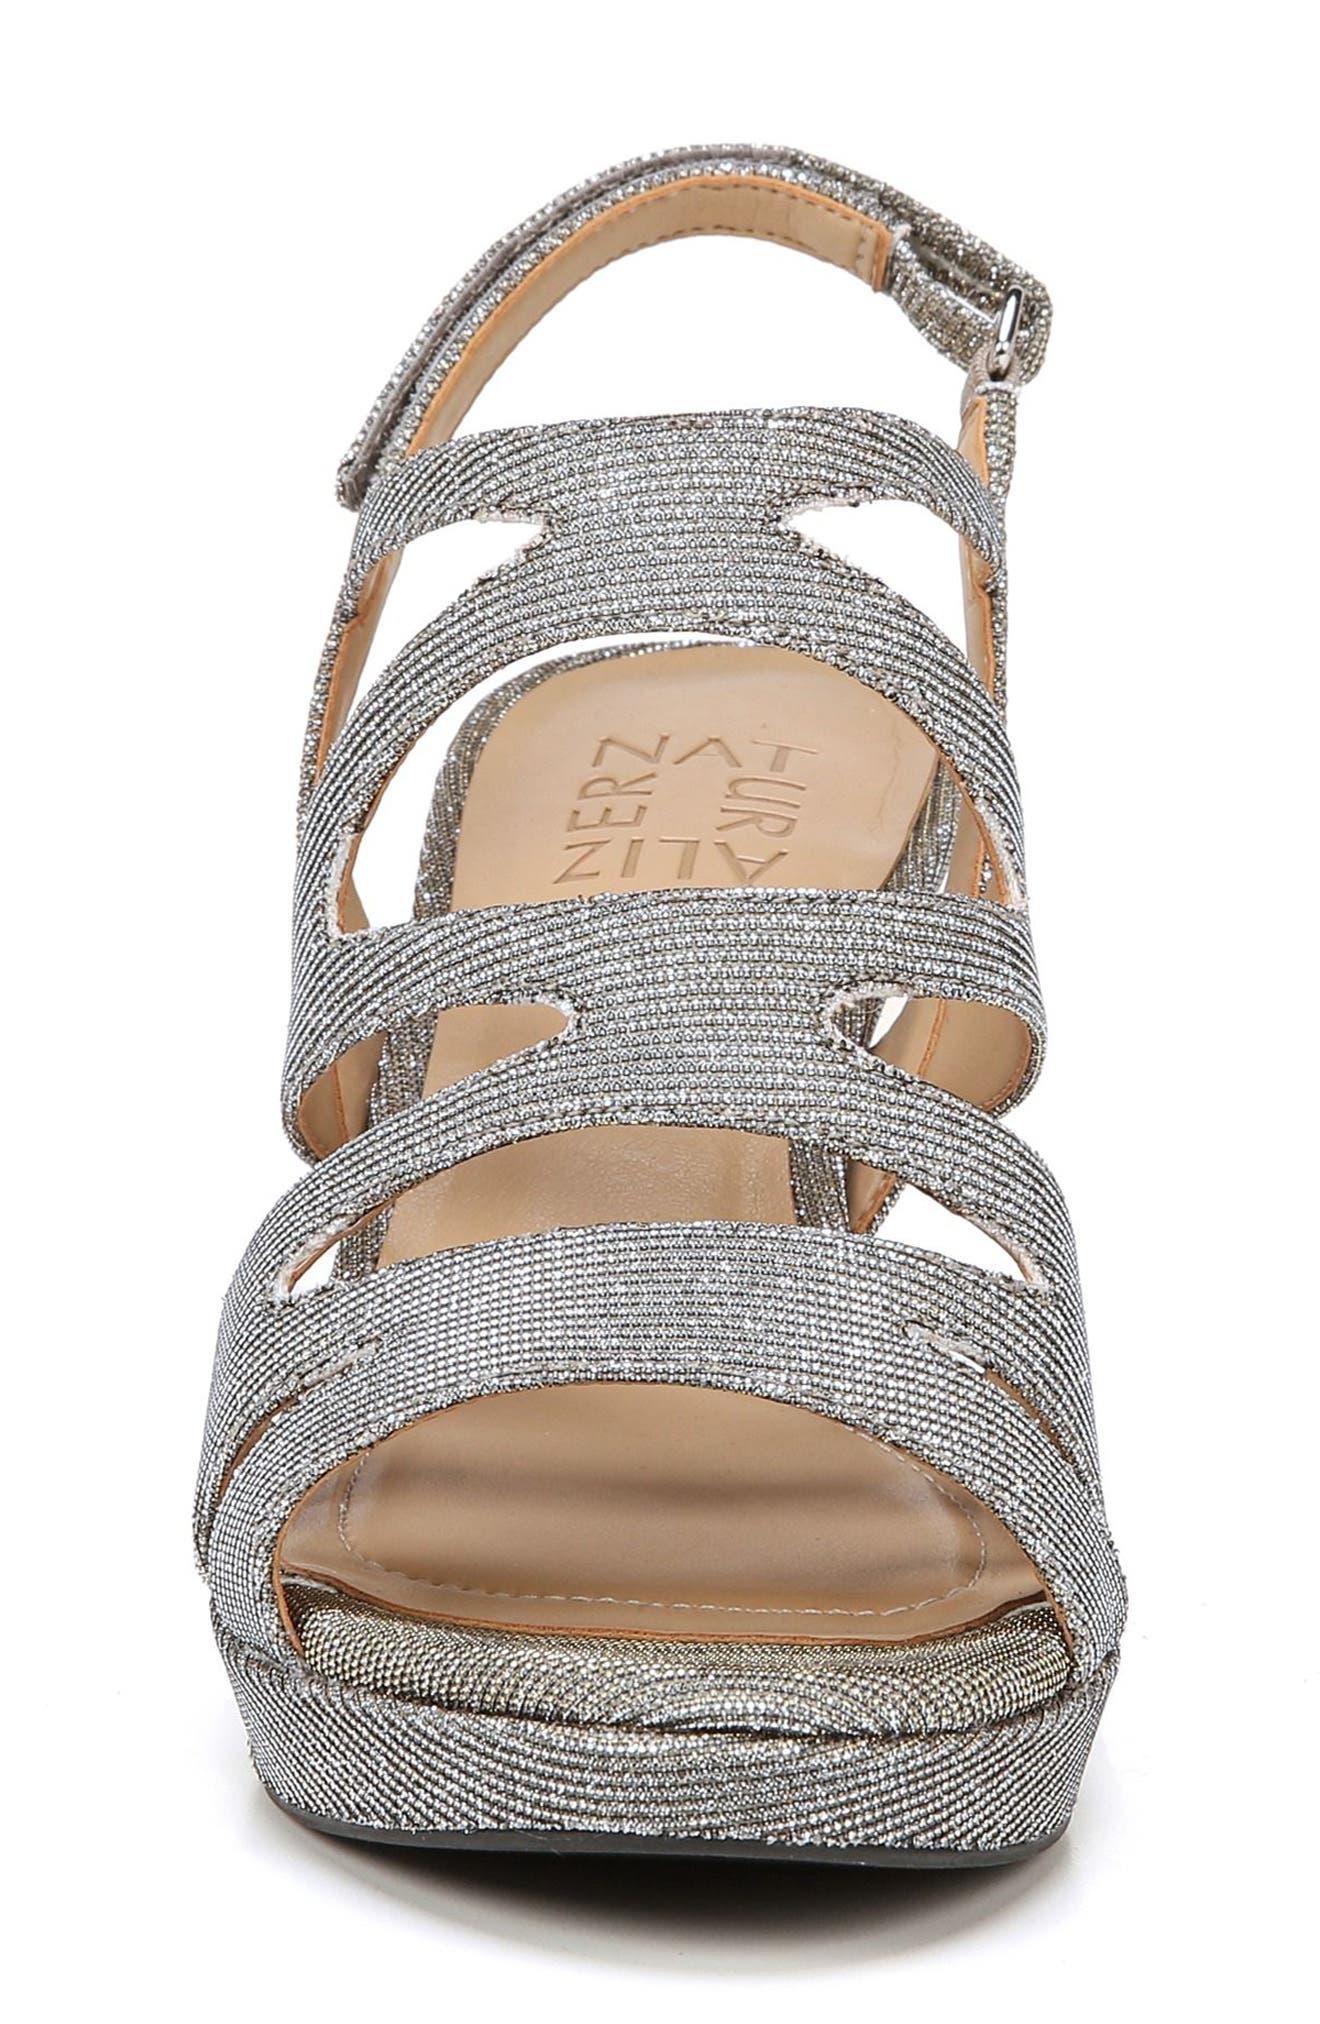 'Pressley' Slingback Platform Sandal,                             Alternate thumbnail 4, color,                             Alloy Sparkle Fabric